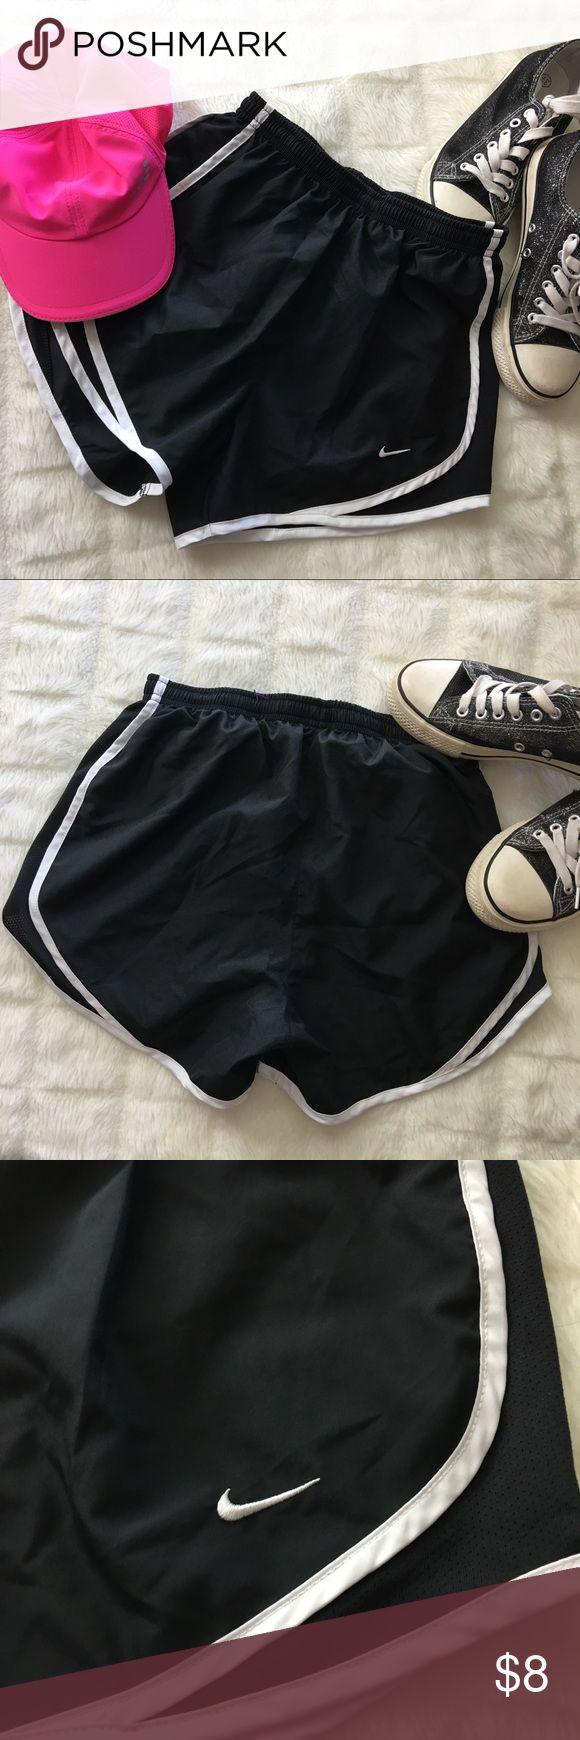 Nike Dri-Fit Shorts XS Black and white Nike shorts. Women's extra small. Nike Shorts